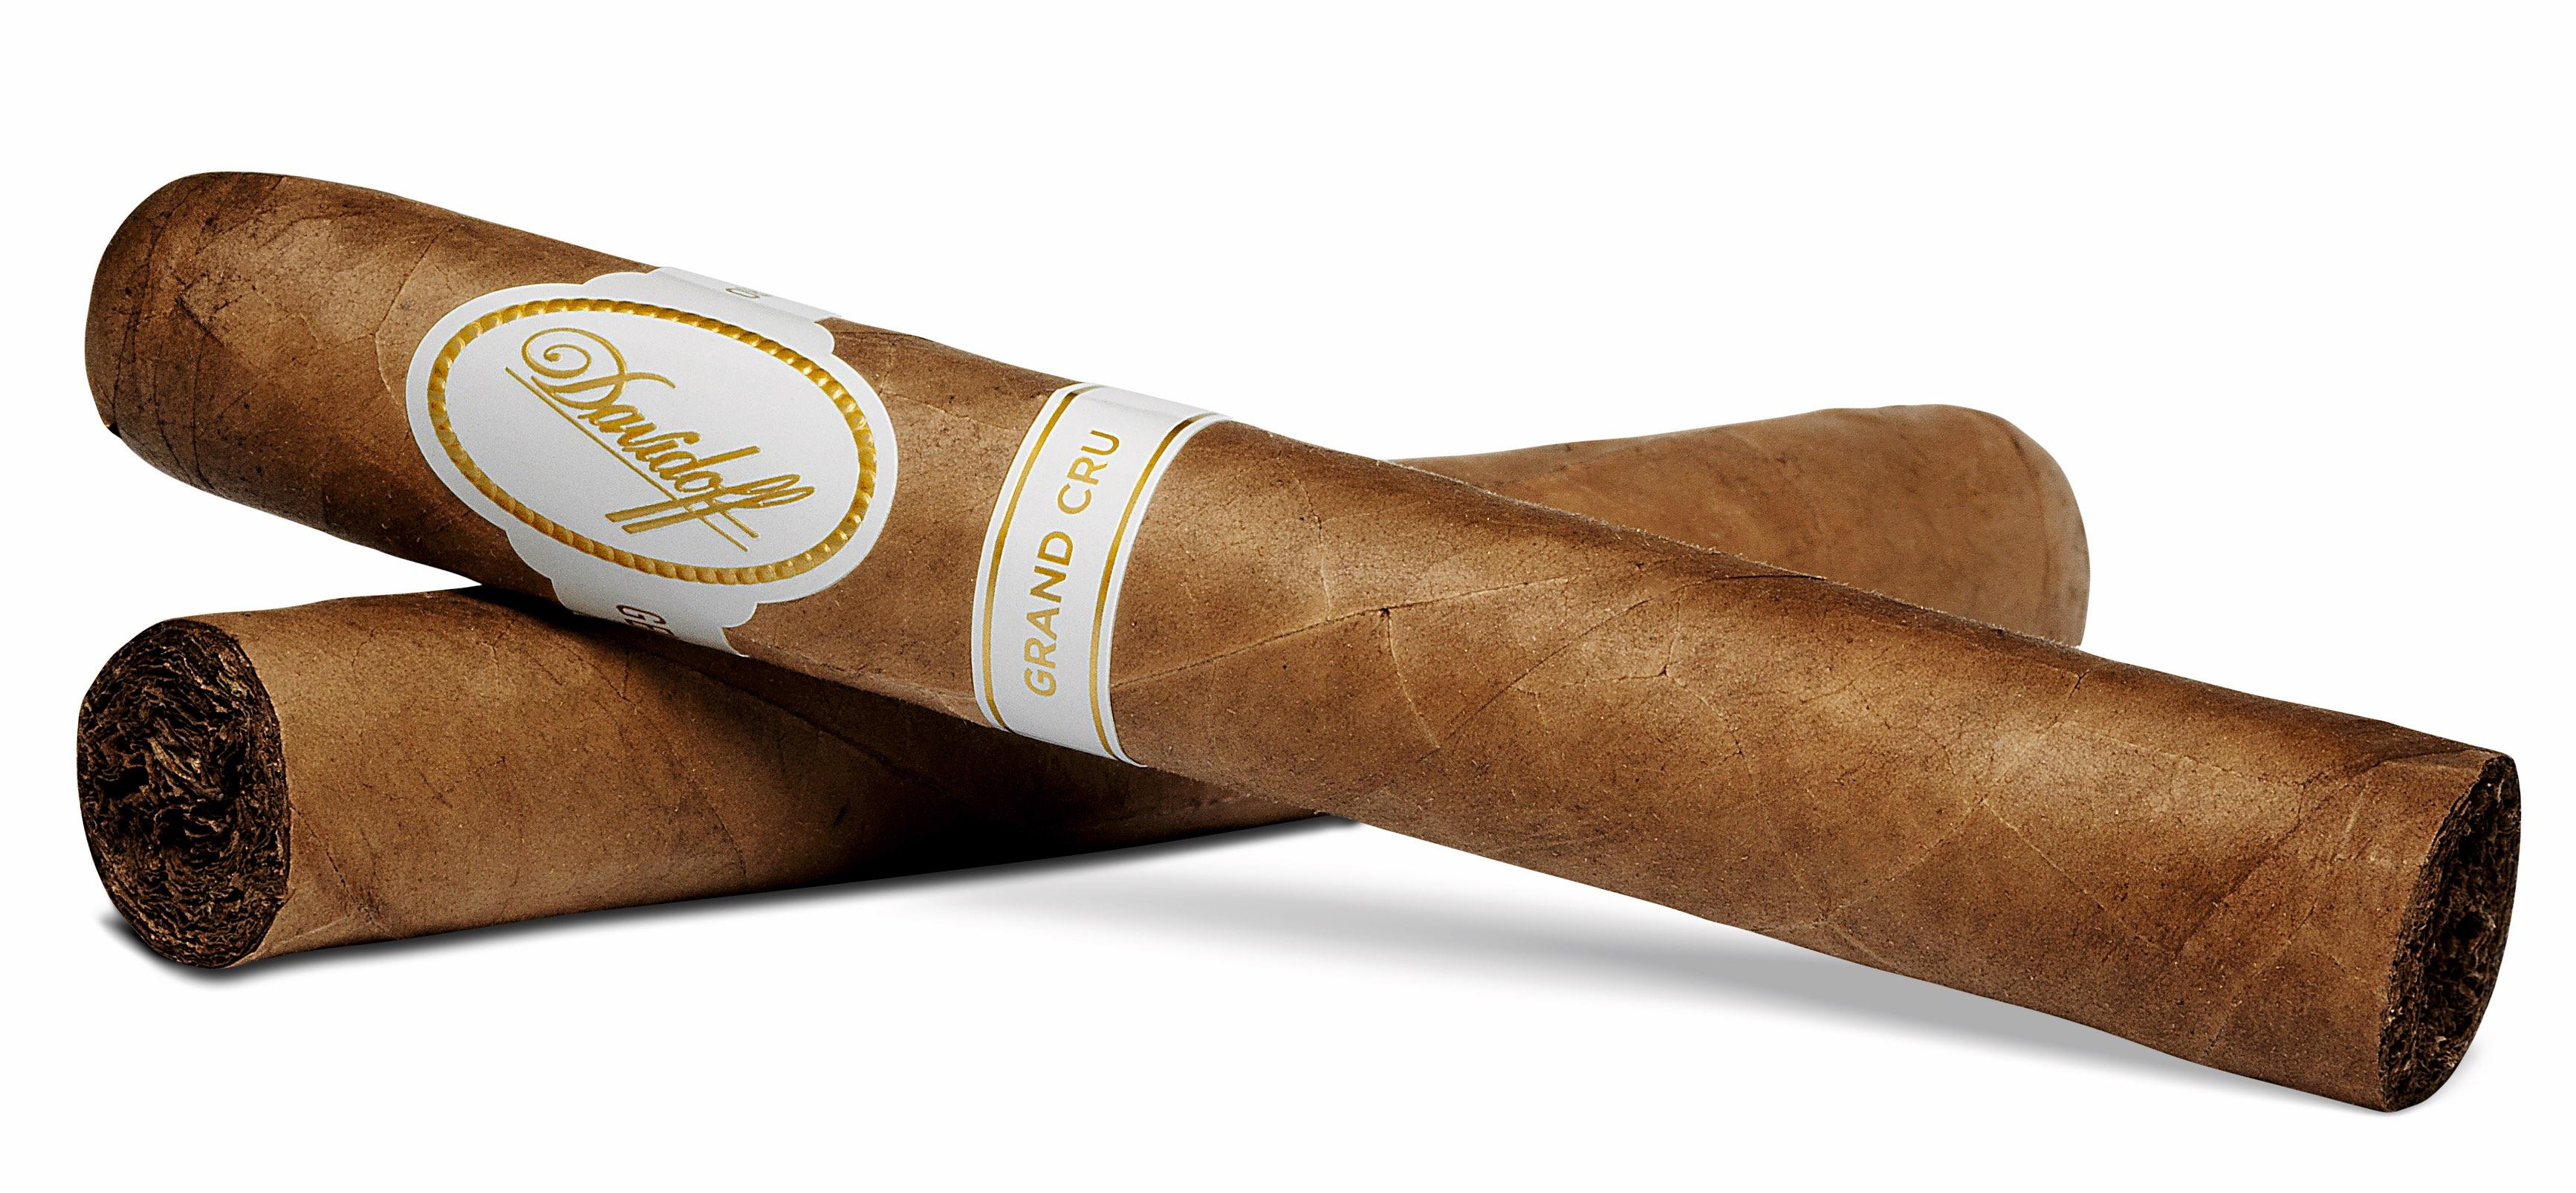 Cigar News: Davidoff Grand Cru Adds Toro and Robusto